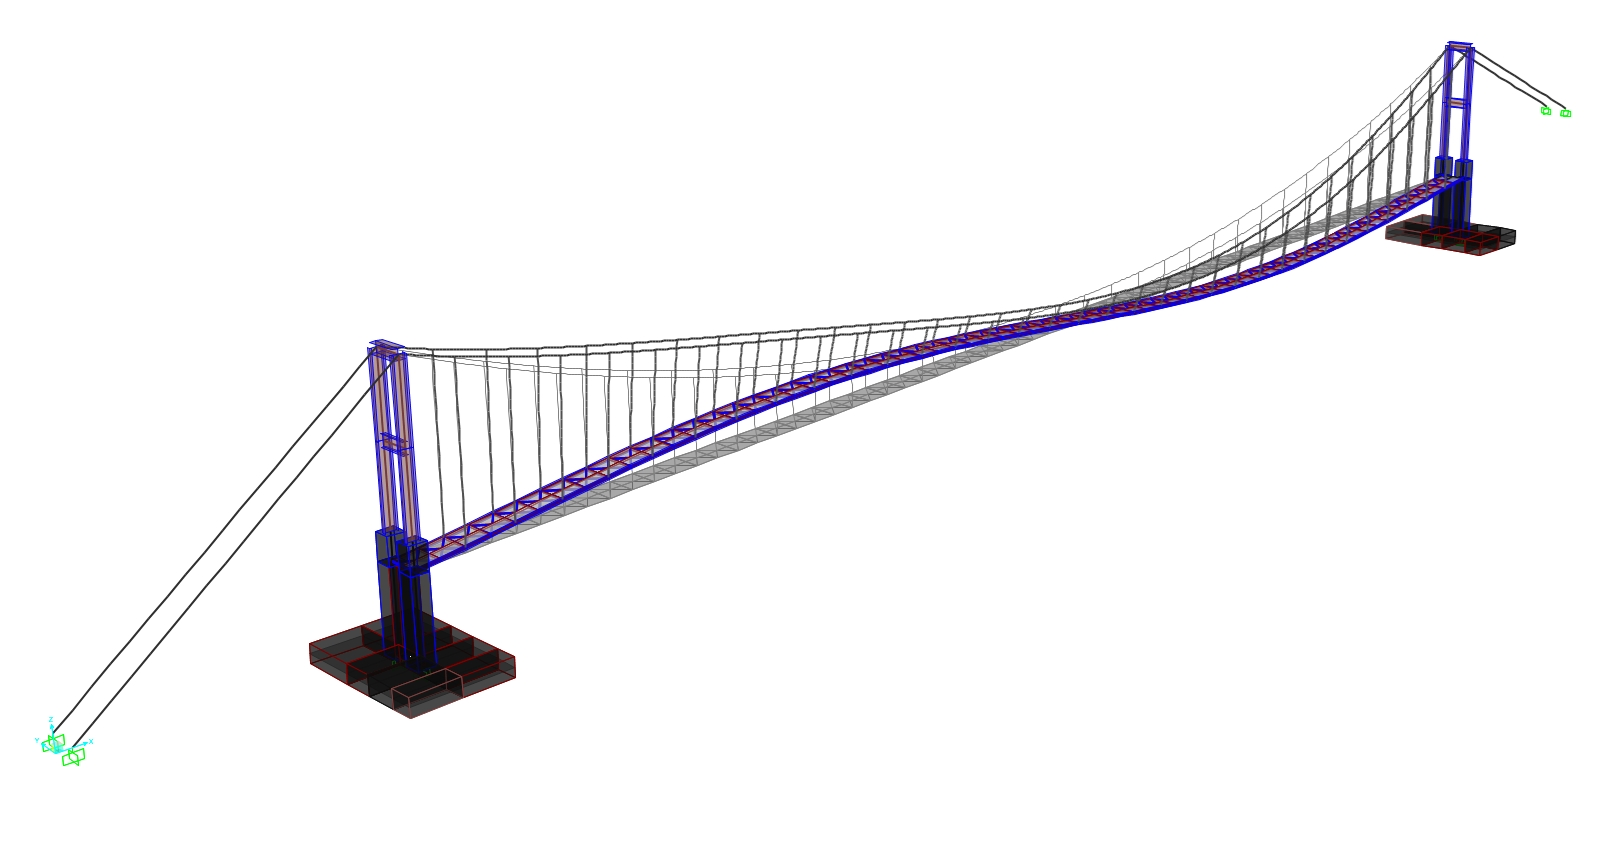 1608x851 Suspension Bridge Over River Arda Near Madjarovo, Bulgaria